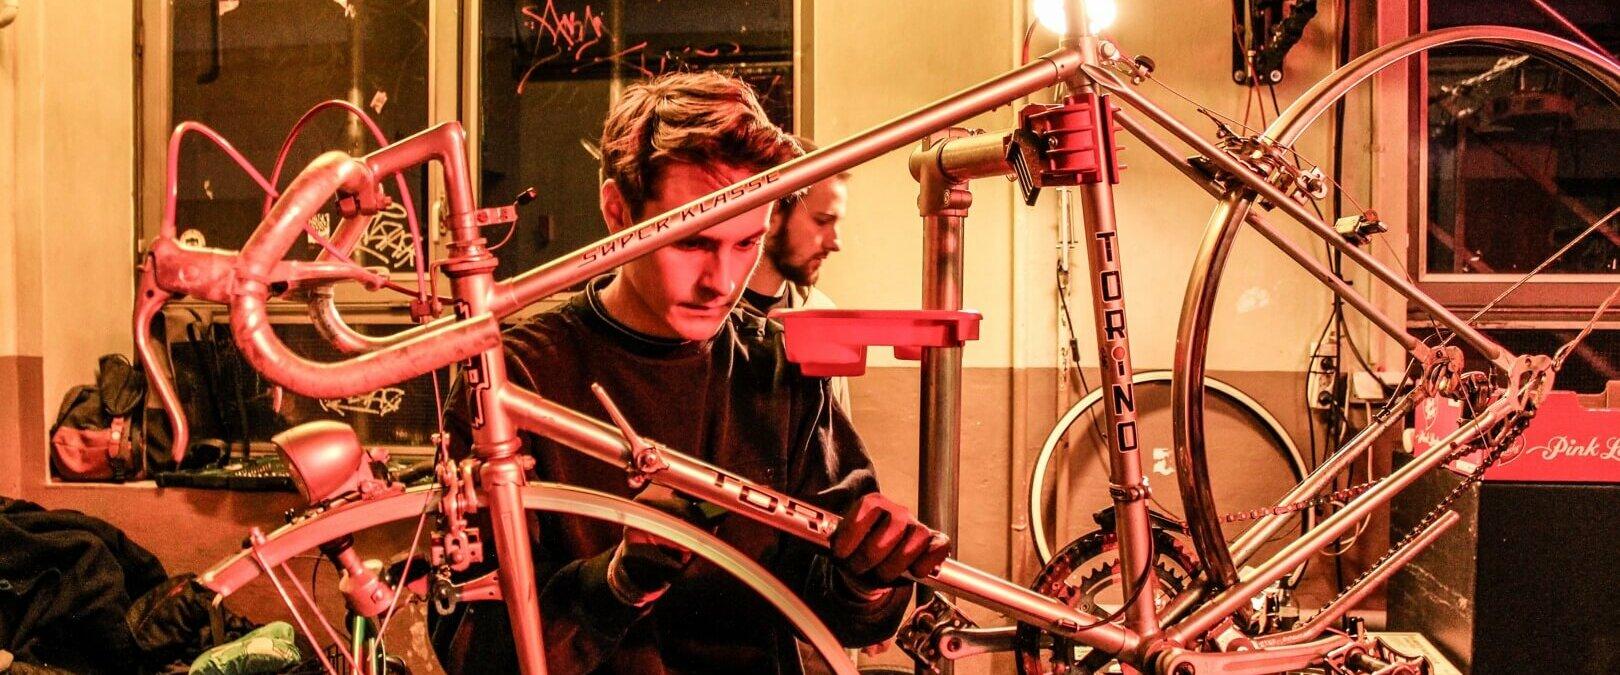 Fahrradreparatur Workshops